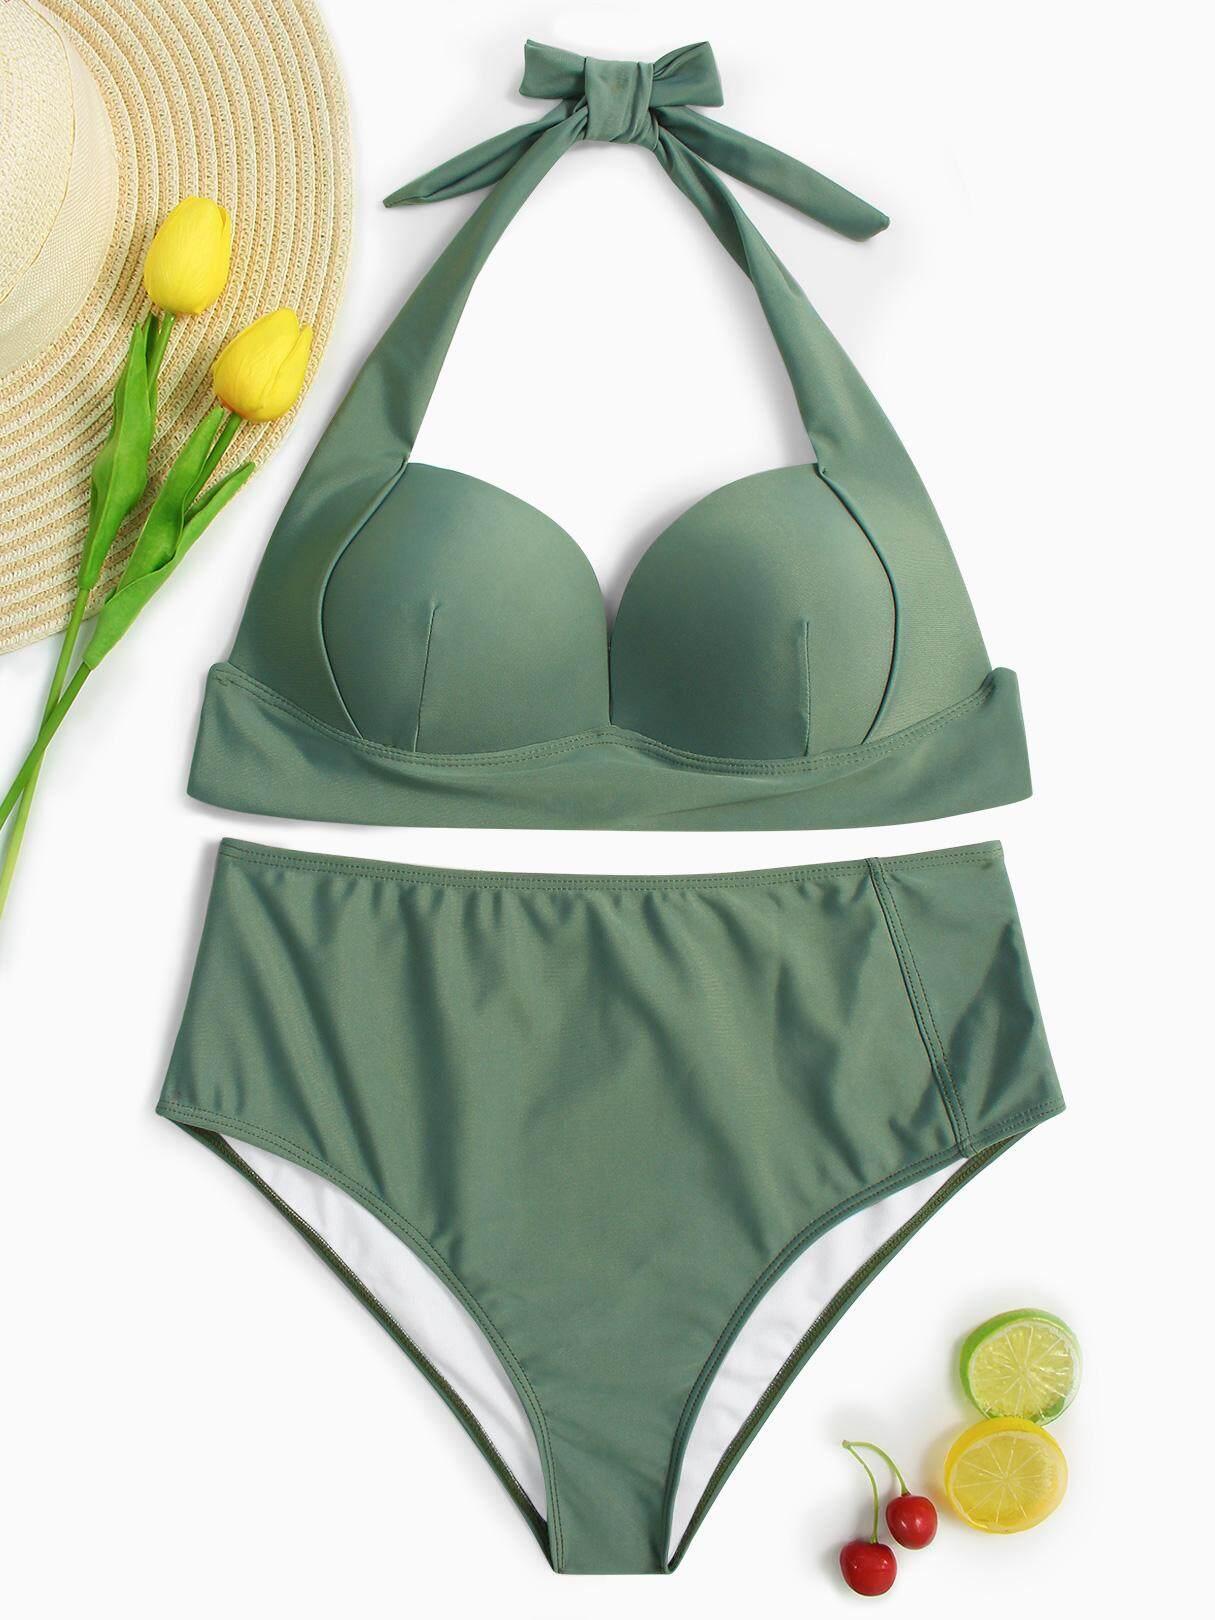 6064abd7ba9 YOINS 2019 Summer Women Halter V-neck Padded Design High-waist Bikini Set